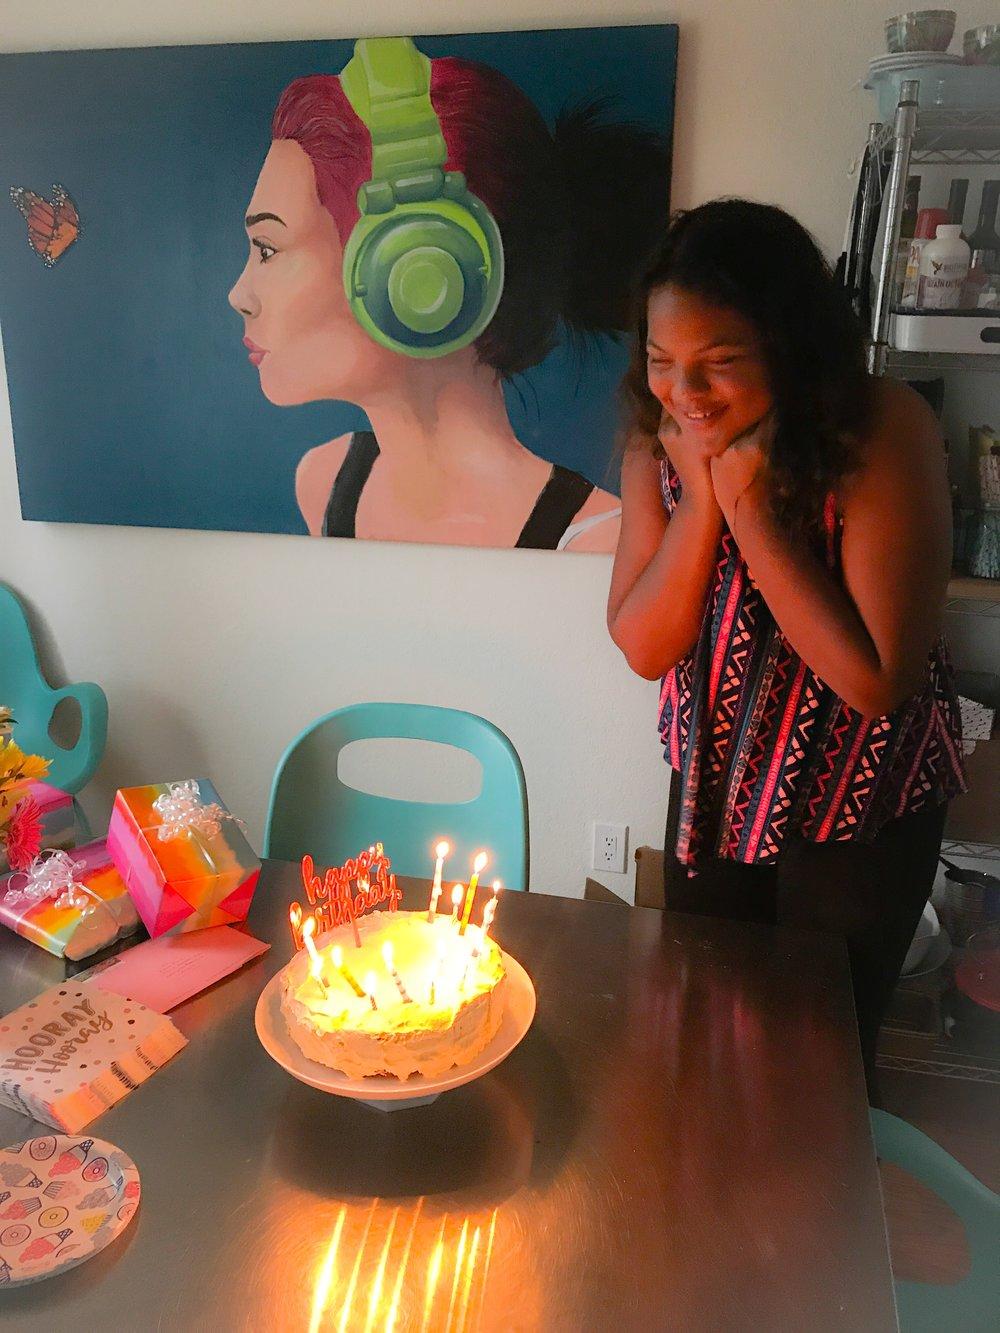 KETO RECIPE: KETO BIRTHDAY CAKE! by Jen Fisch via Keto In The City